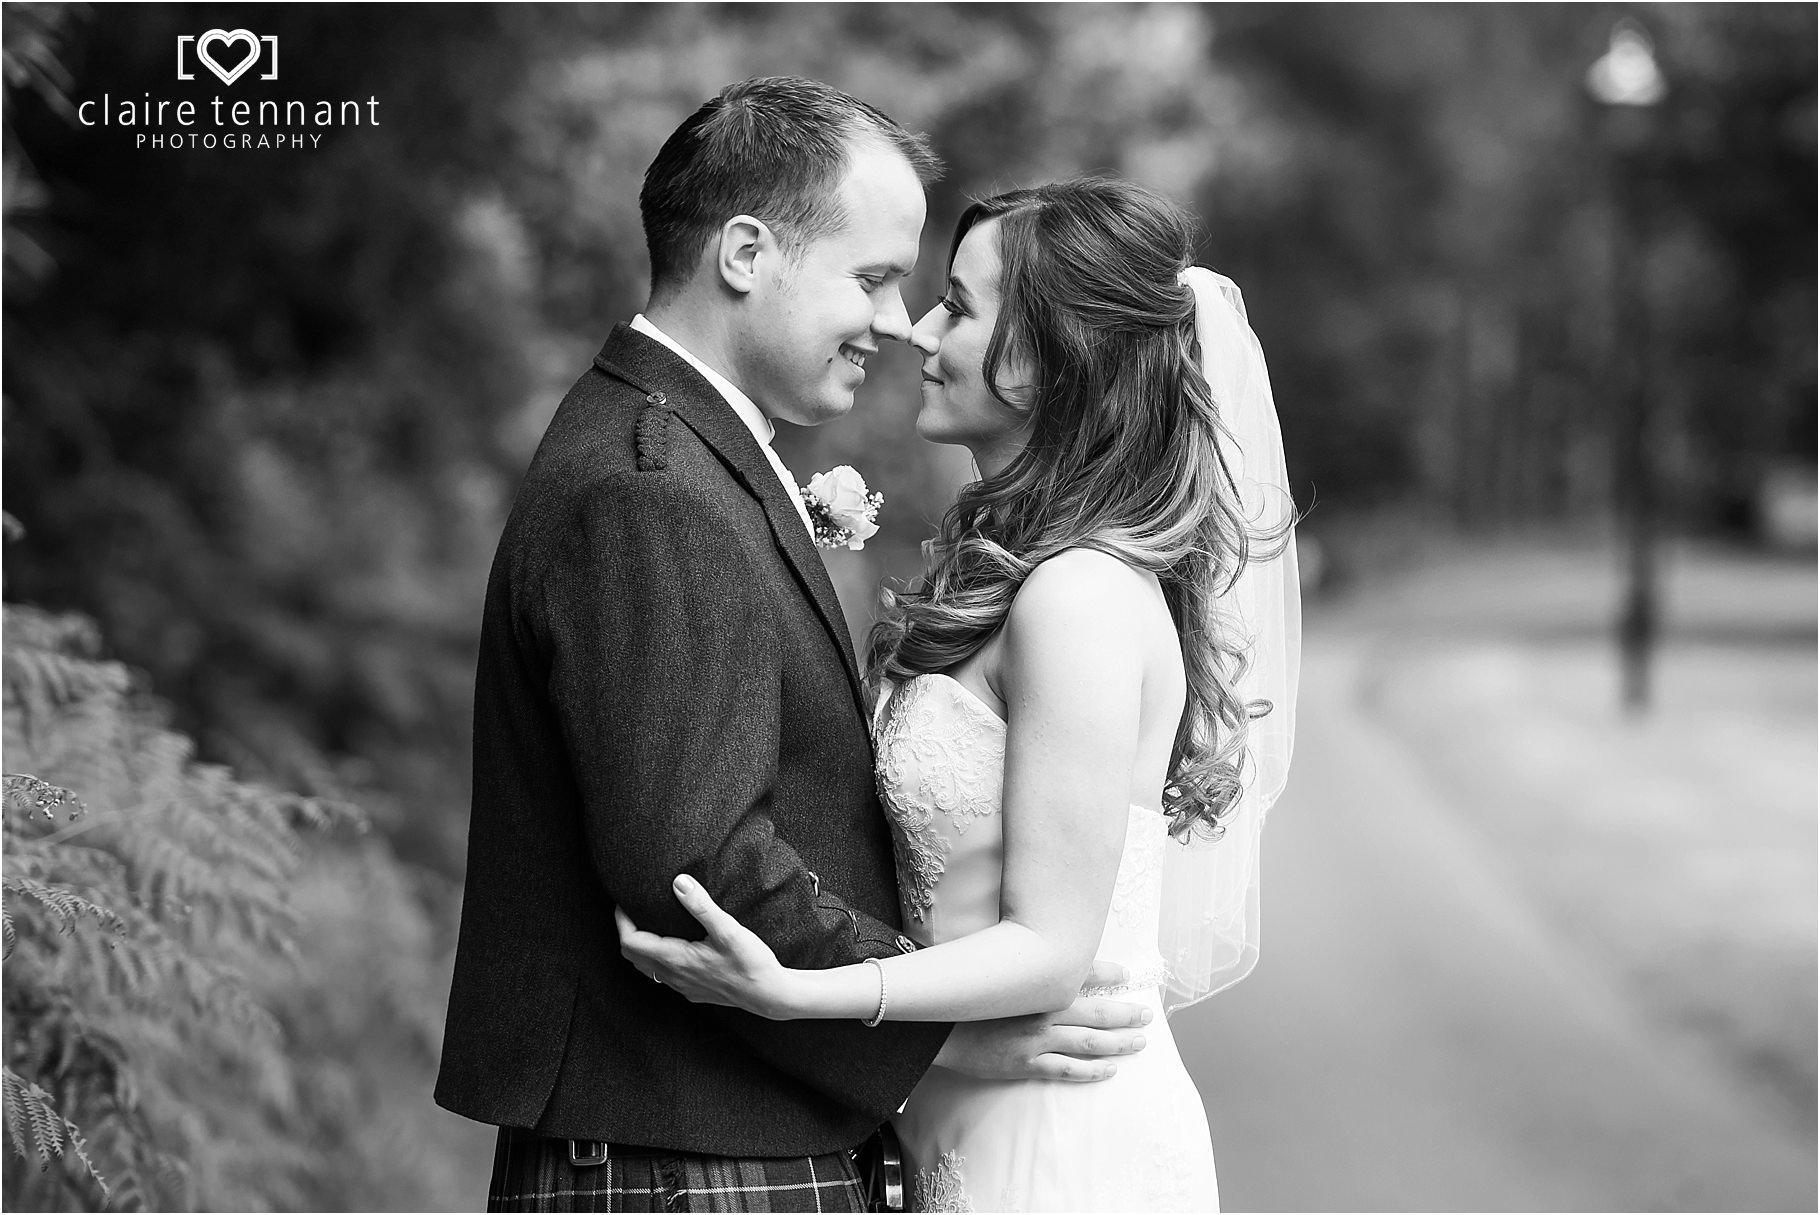 2016 wedding photography highlights Midlothian